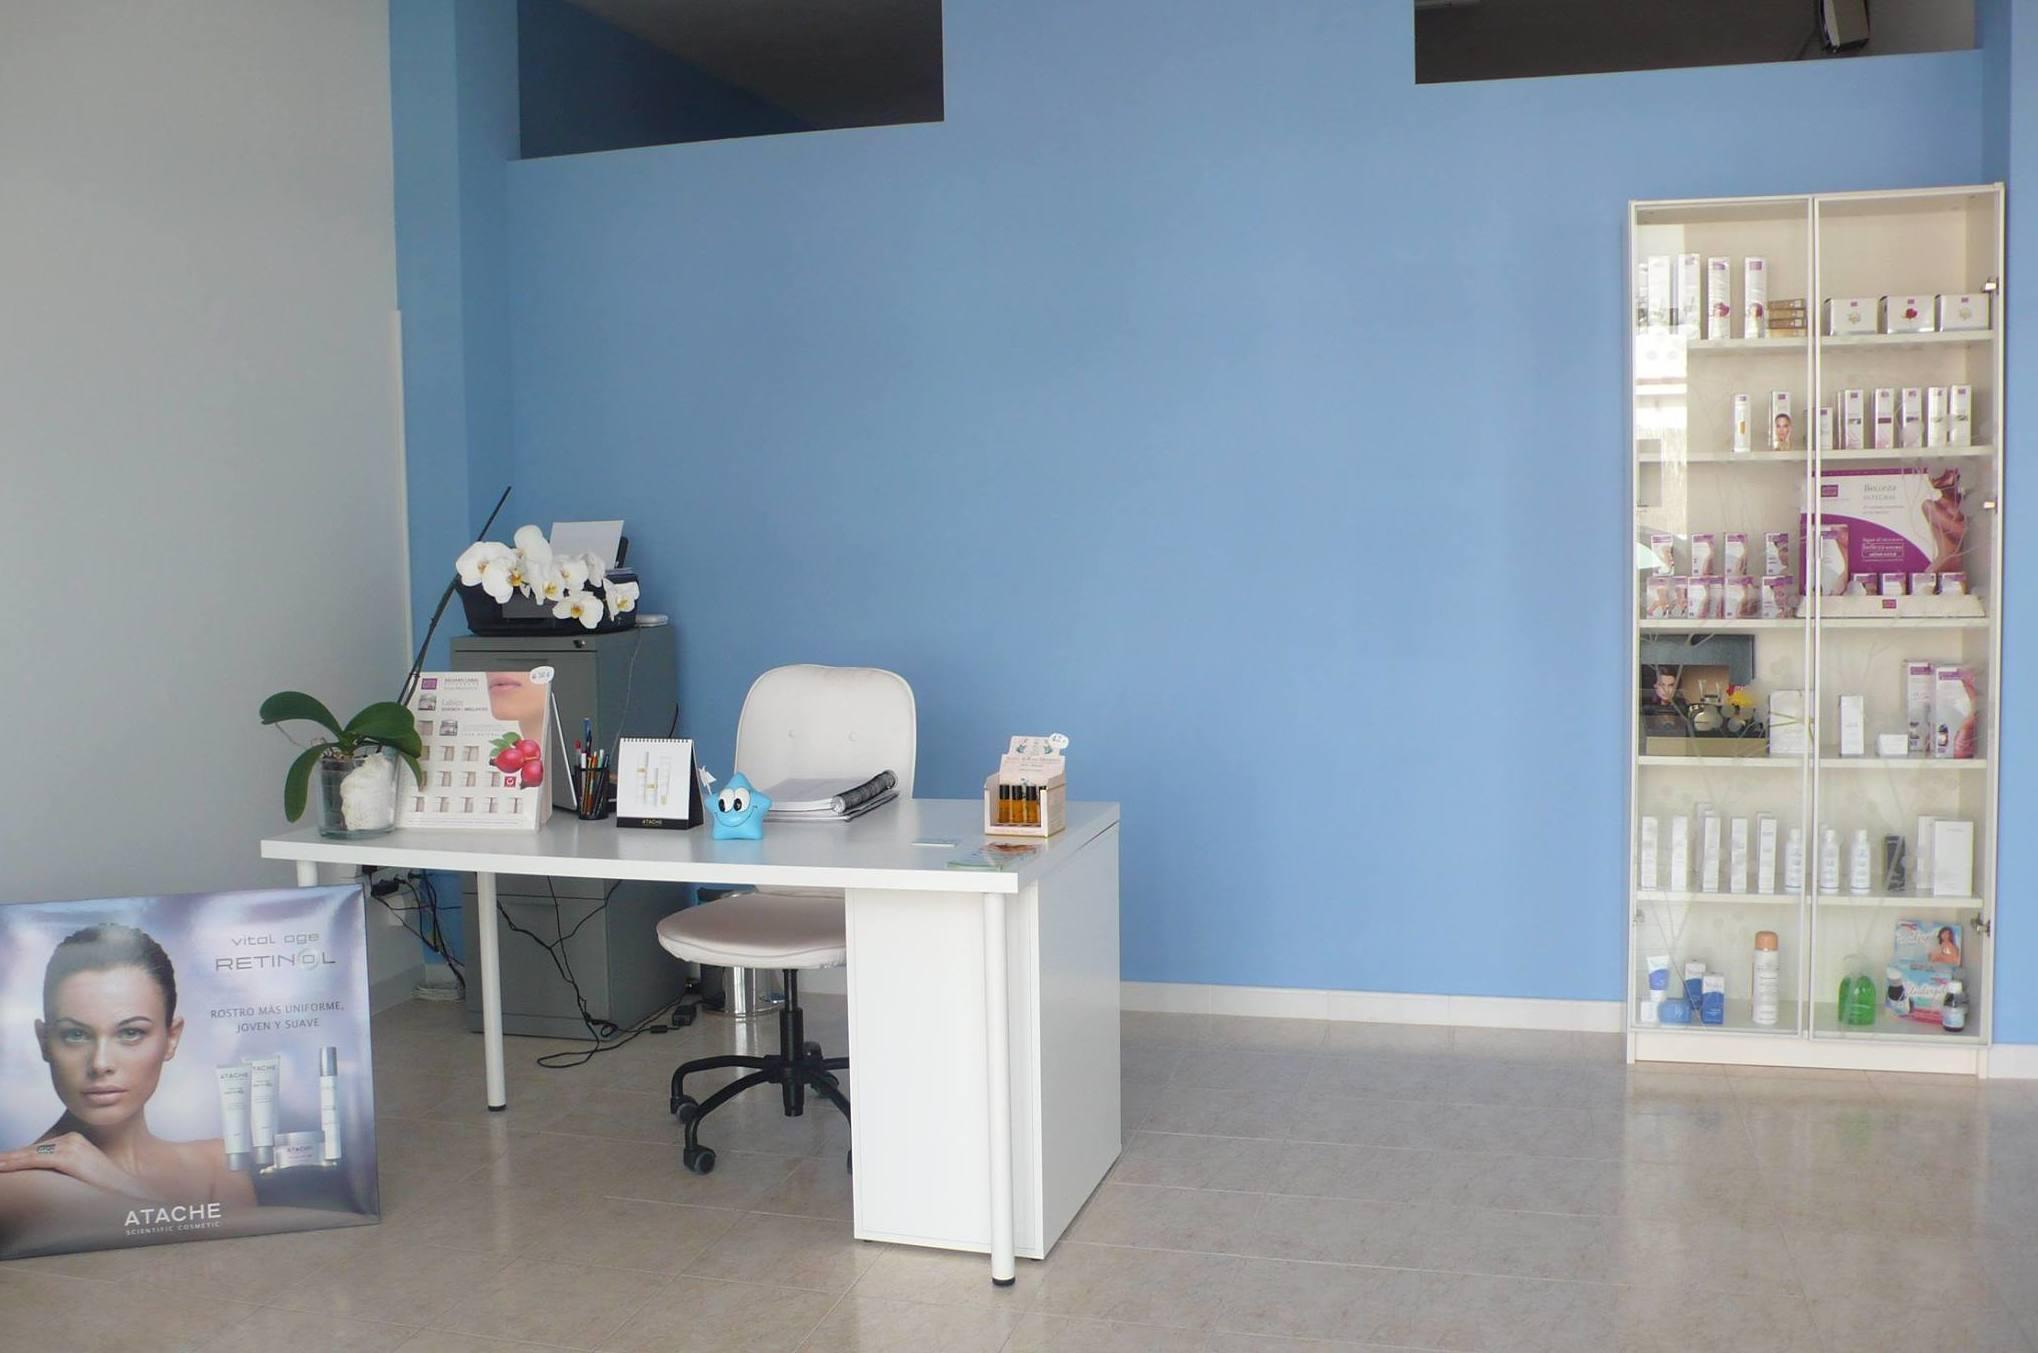 Centro de estética Mímate en Ibiza